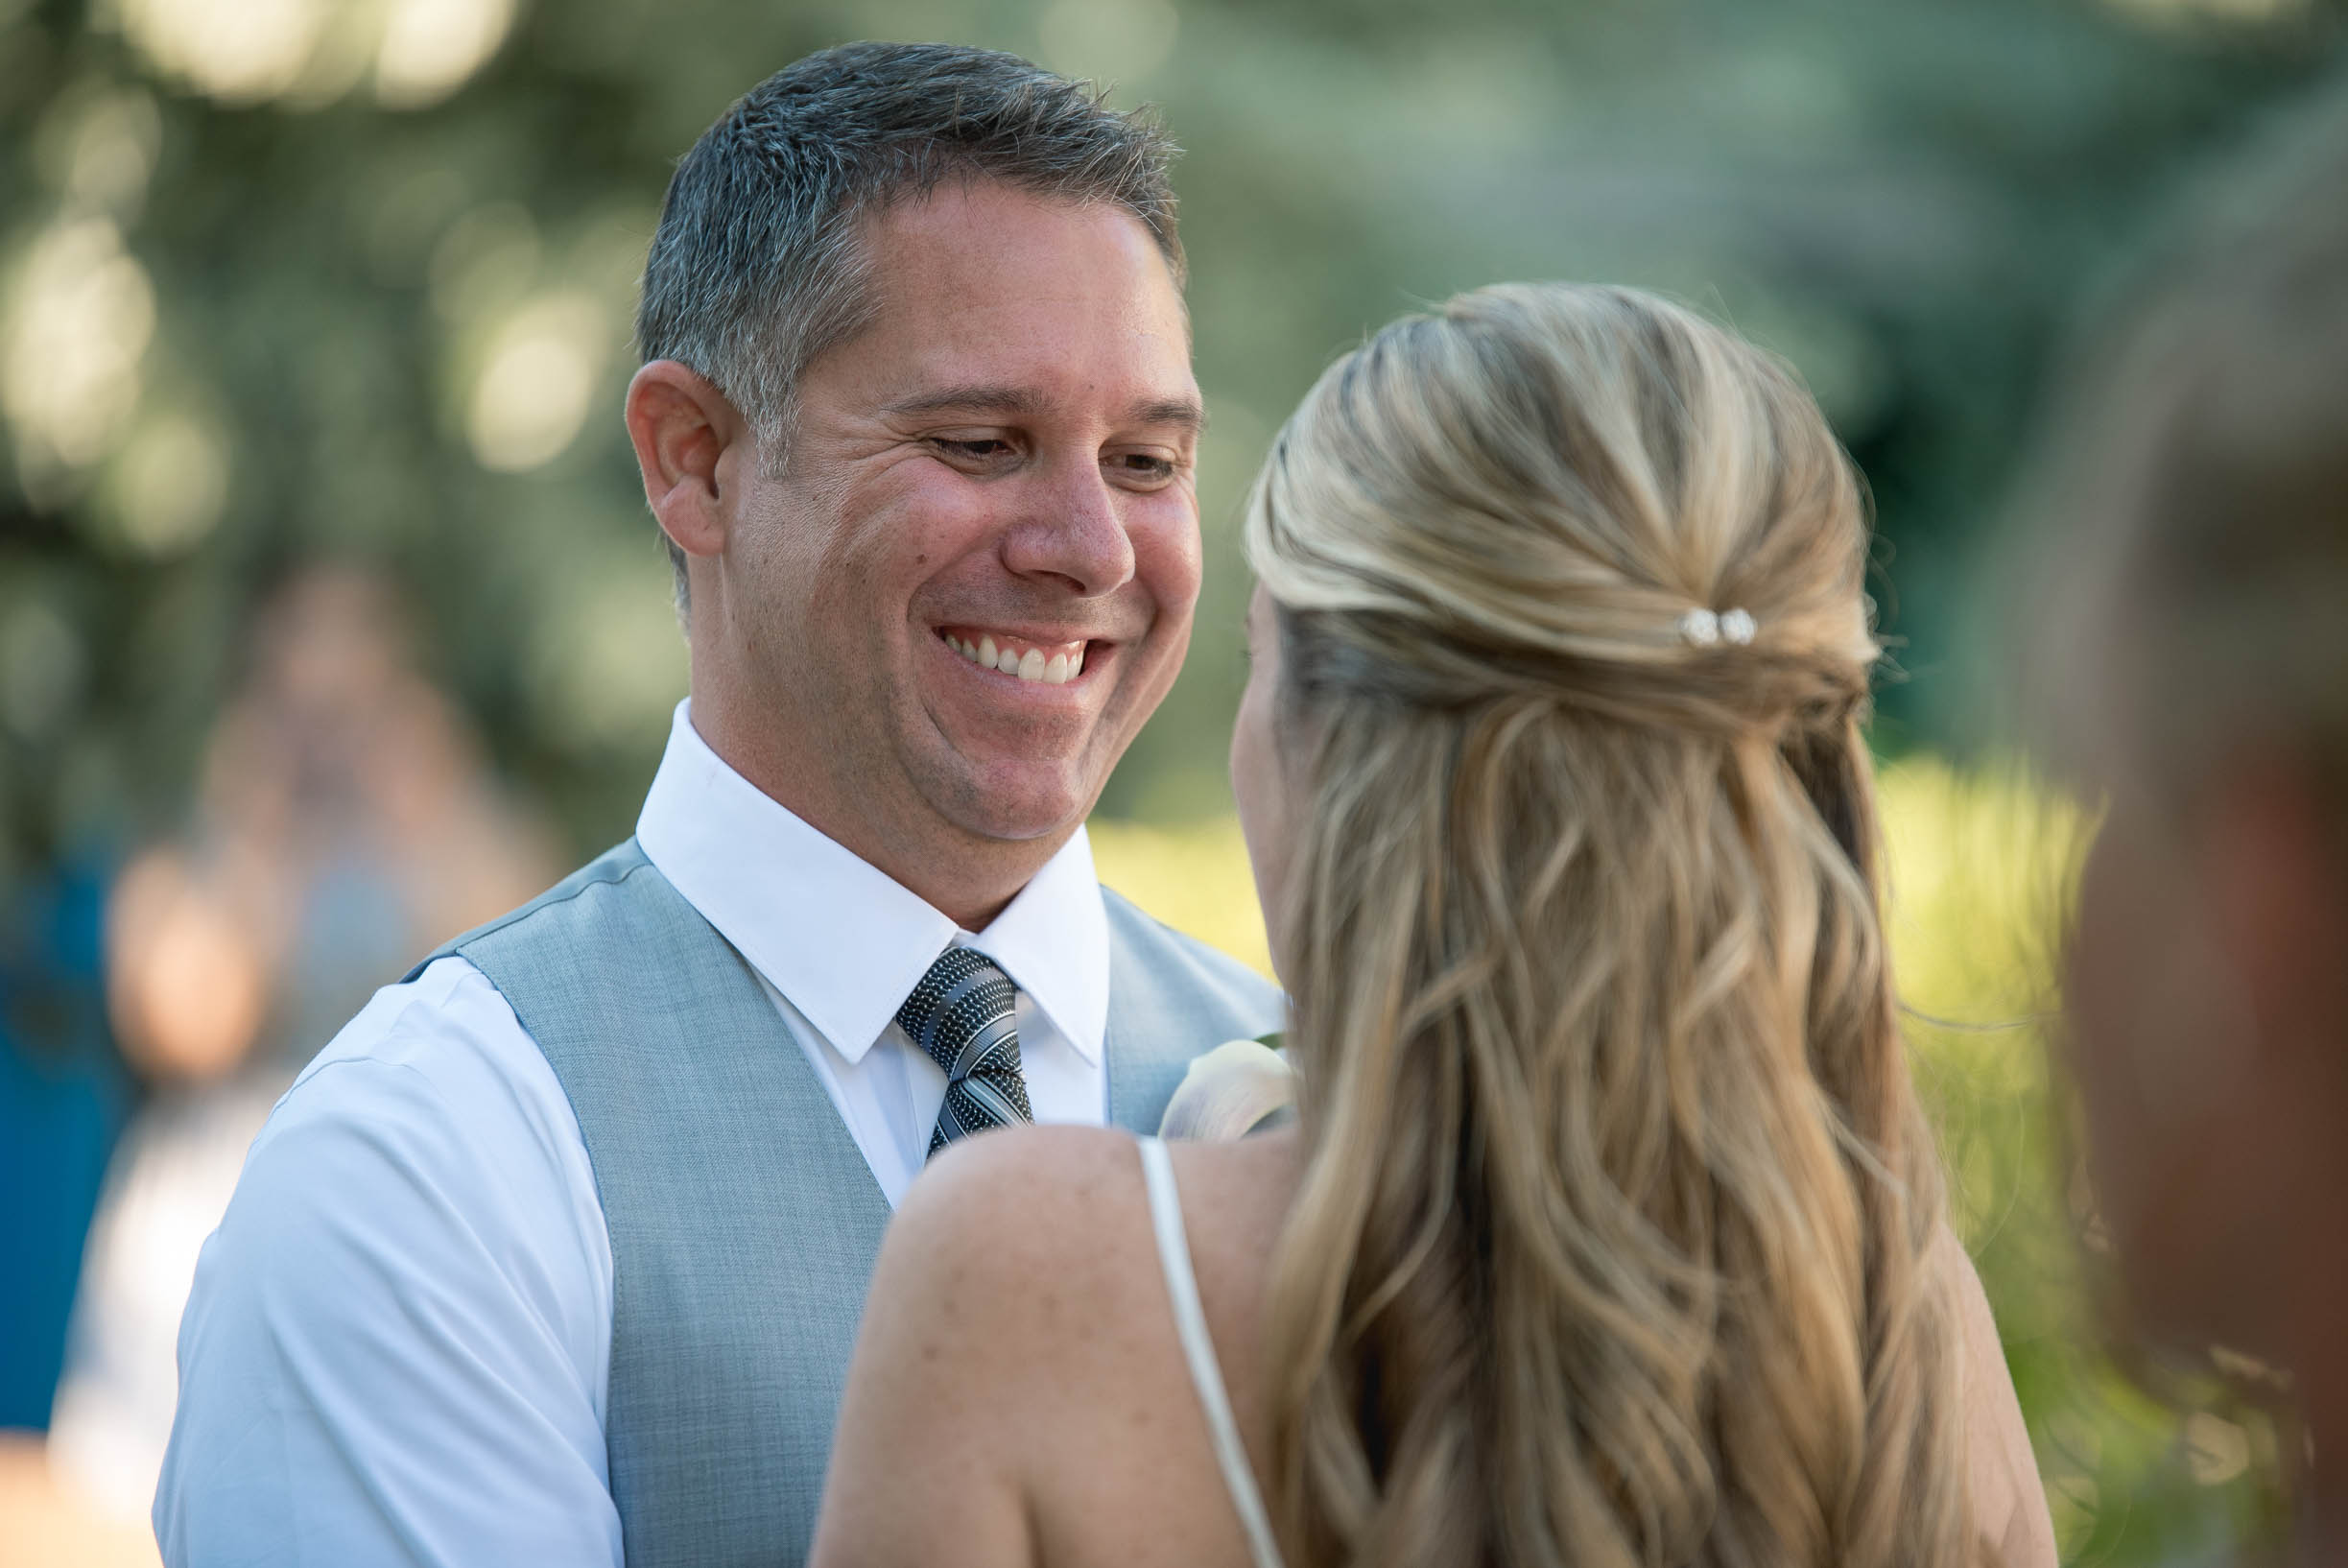 047Portland Wedding Photographer timothy capp.jpg